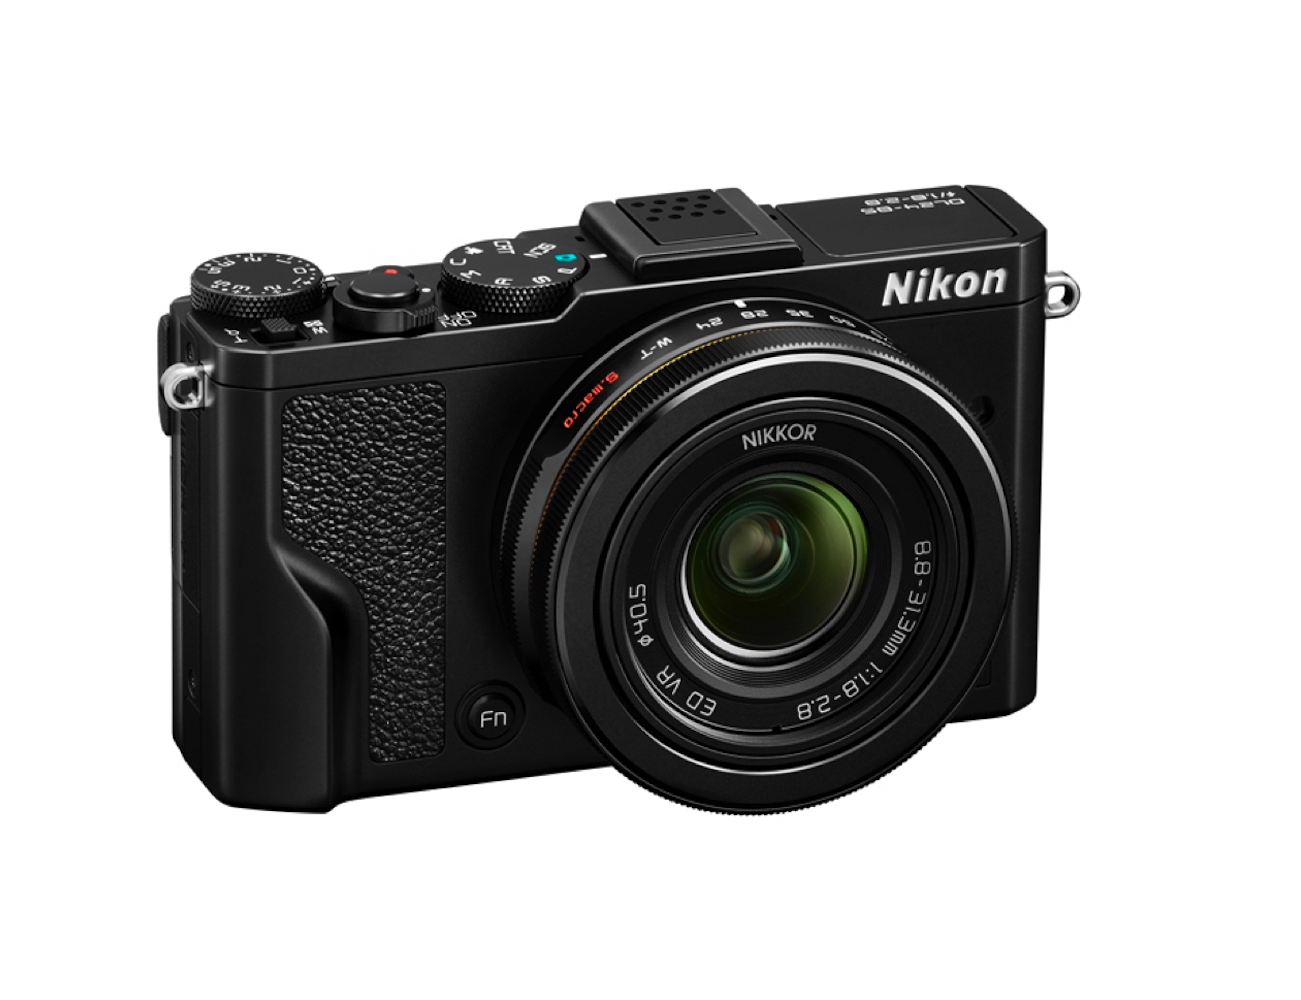 Nikon DL Compact Camera Series